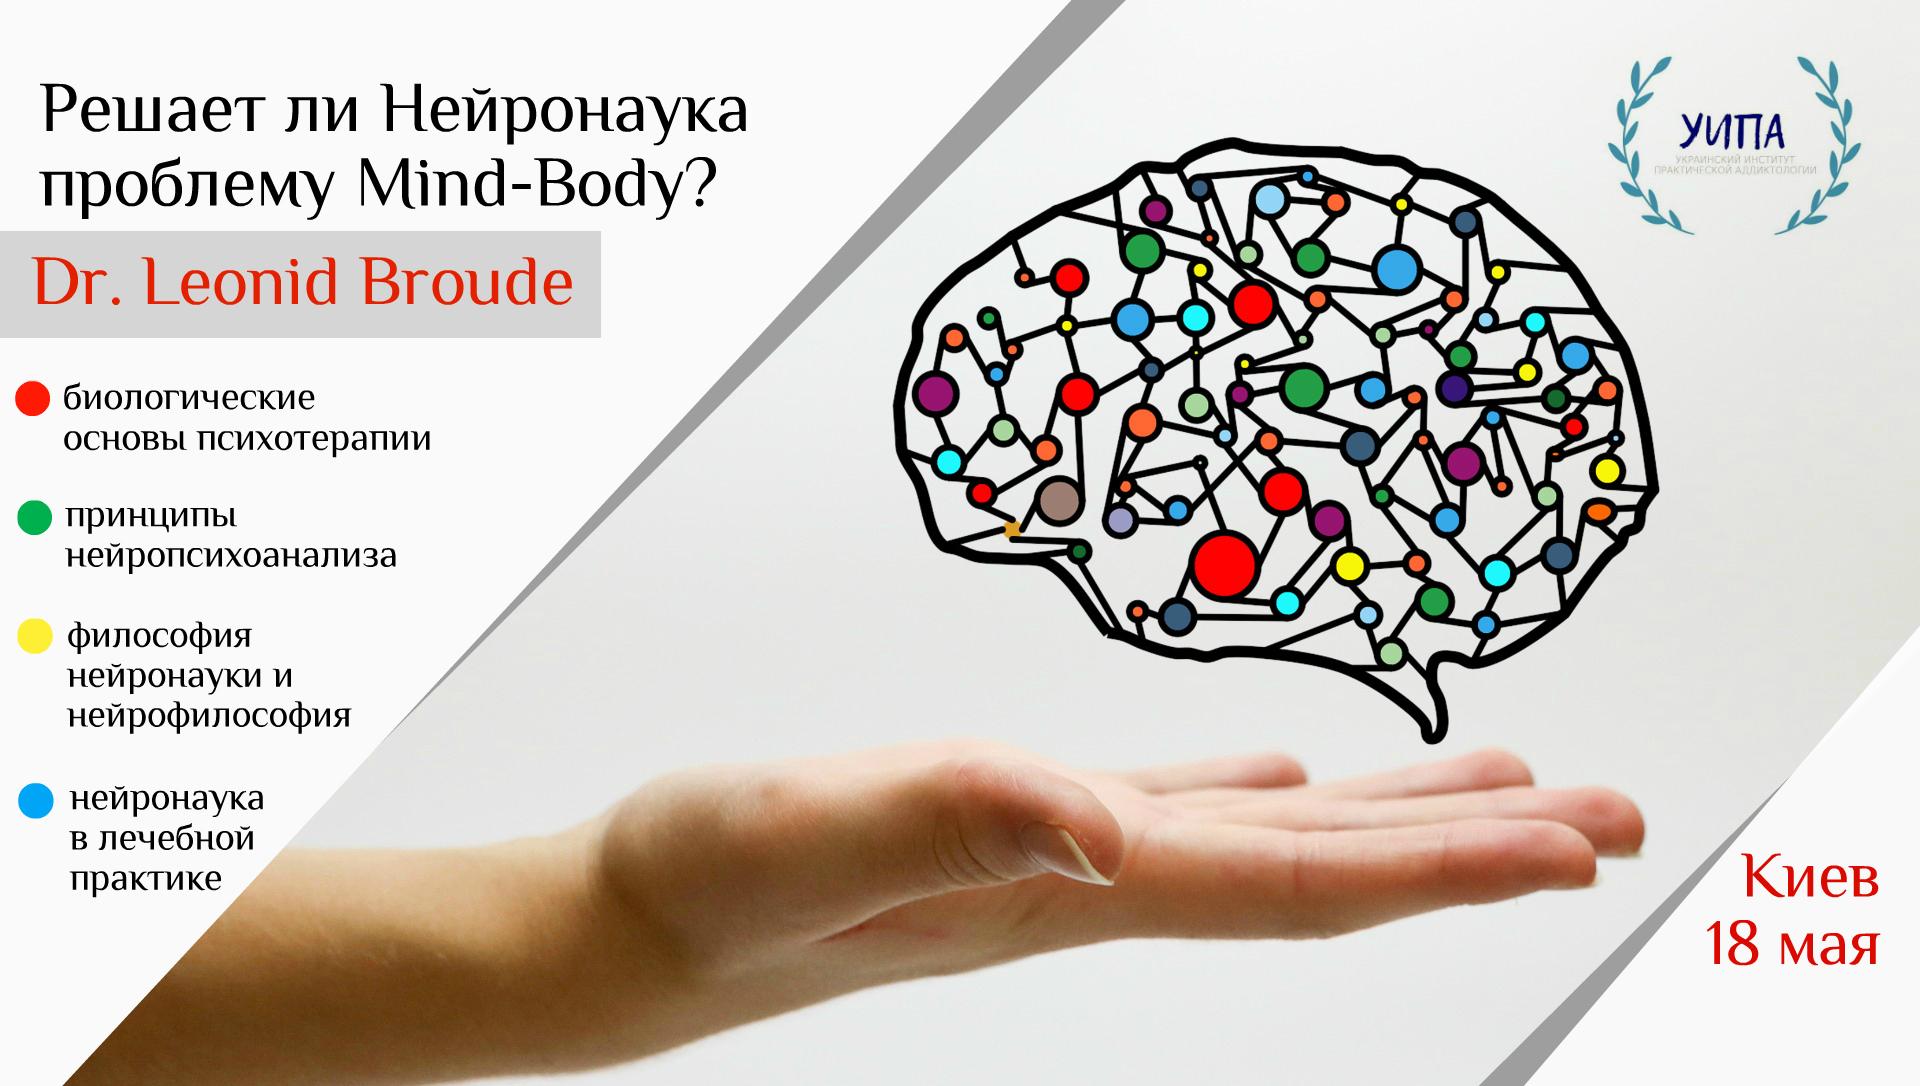 Решает ли Нейронаука проблему Mind-Body?